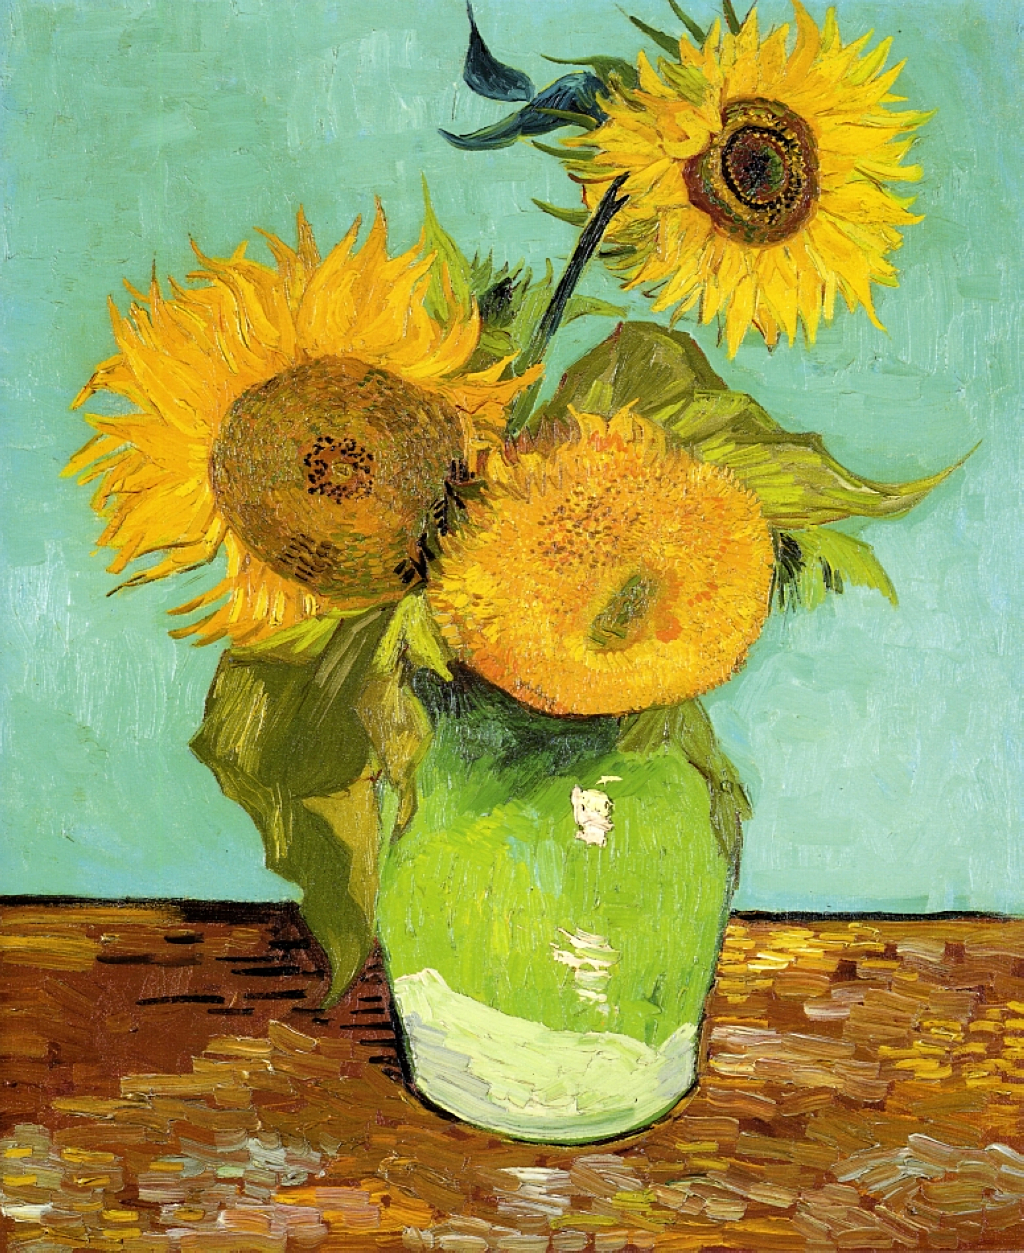 Matrimonio Girasoli Van Gogh : Vincent van gogh sunflowers series la serie dei